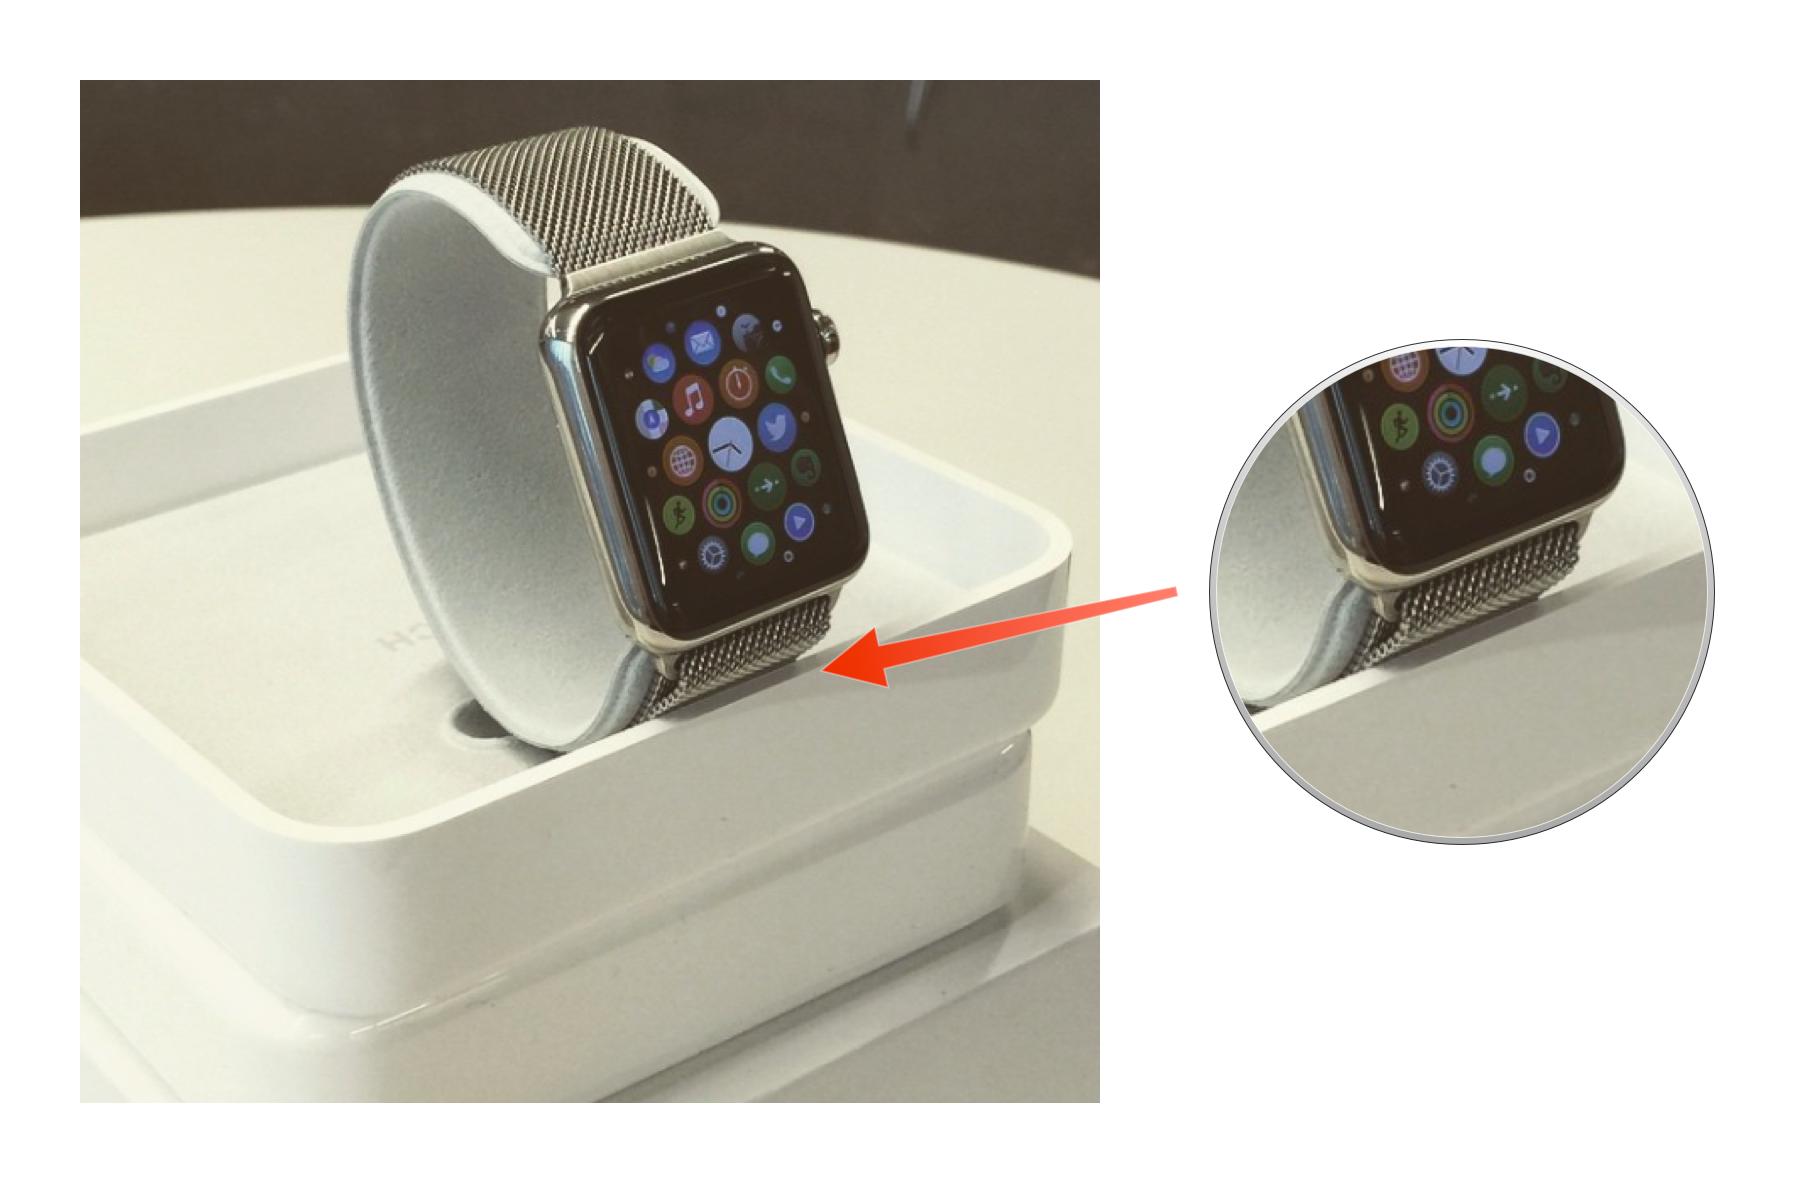 verpackung der apple watch gesichtet. Black Bedroom Furniture Sets. Home Design Ideas